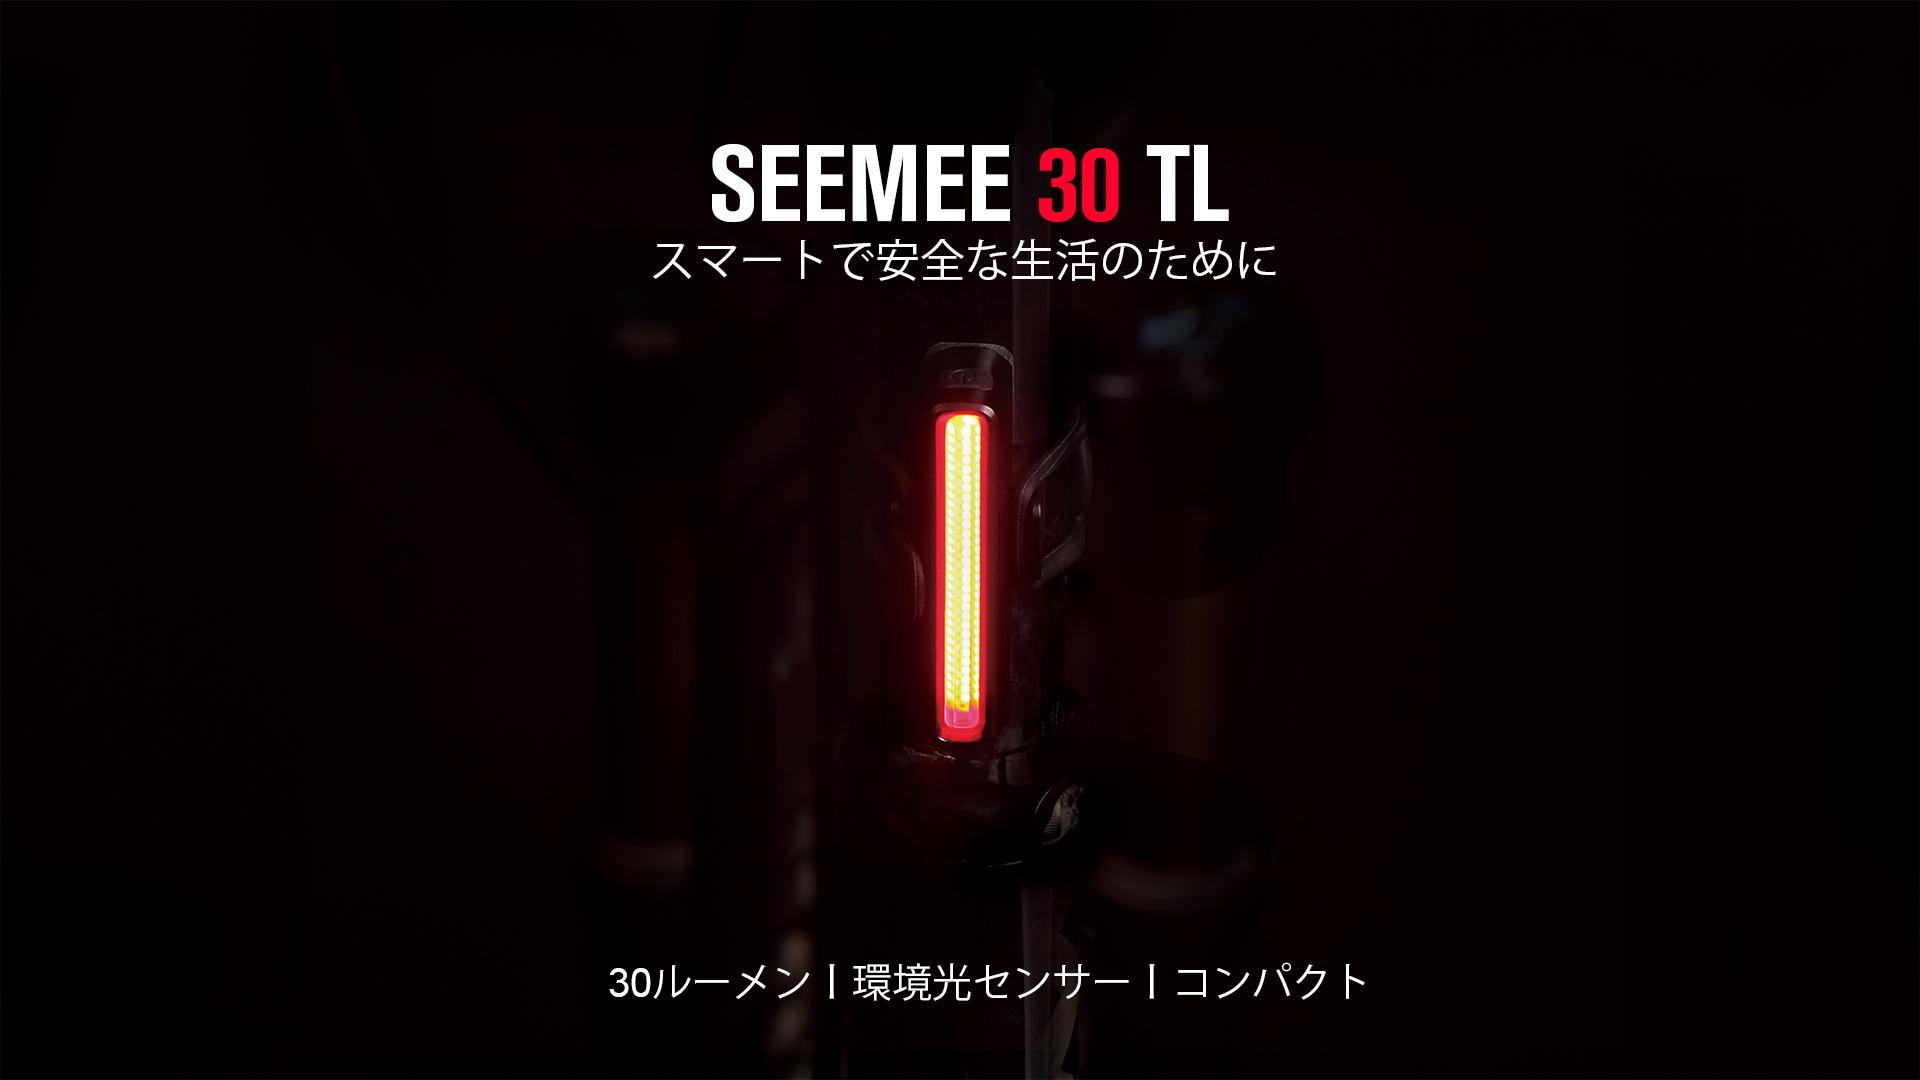 SEEMEE 30 TLは、赤い充電式ナイトサイクリングリアライトです。